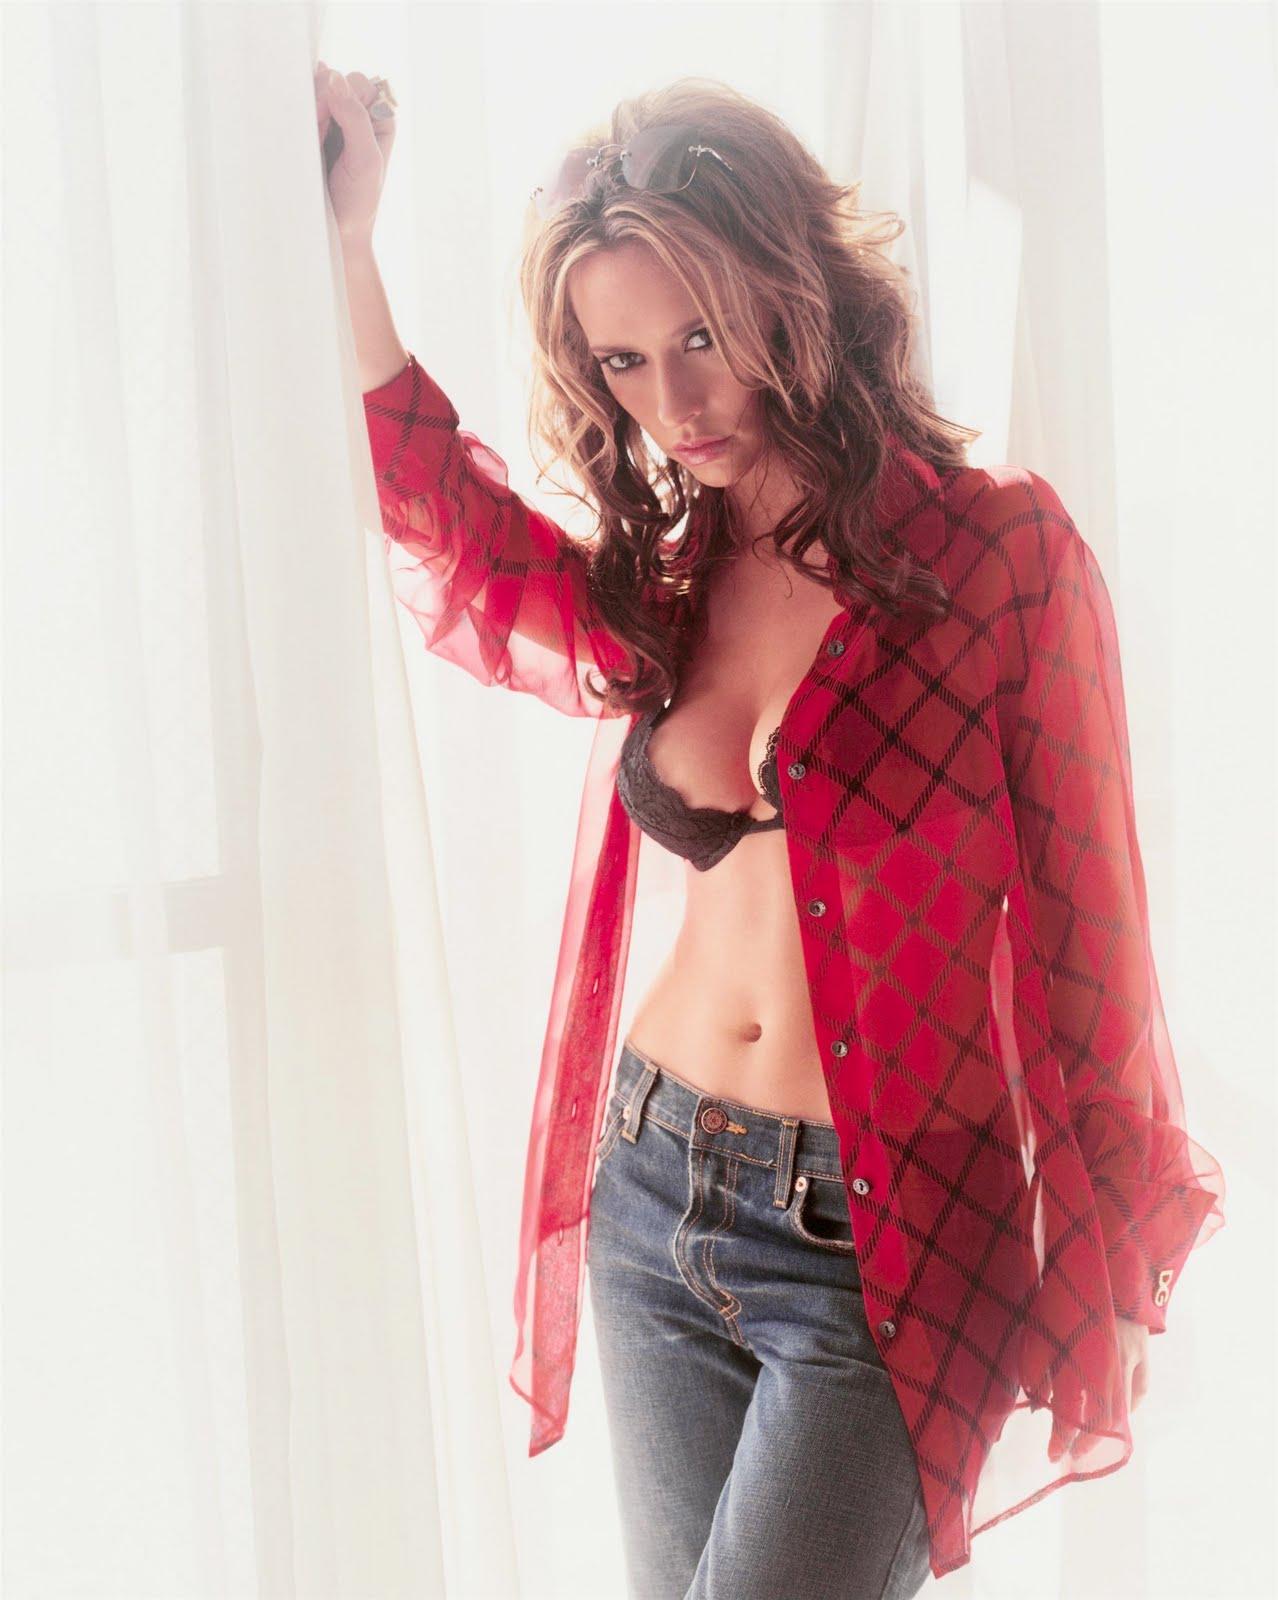 http://1.bp.blogspot.com/_1oKdpaFhVaA/TFekvXyiQzI/AAAAAAAABWM/ekayXGyKYGM/s1600/jennifer_love_hewitt_plaid_shirt.jpg